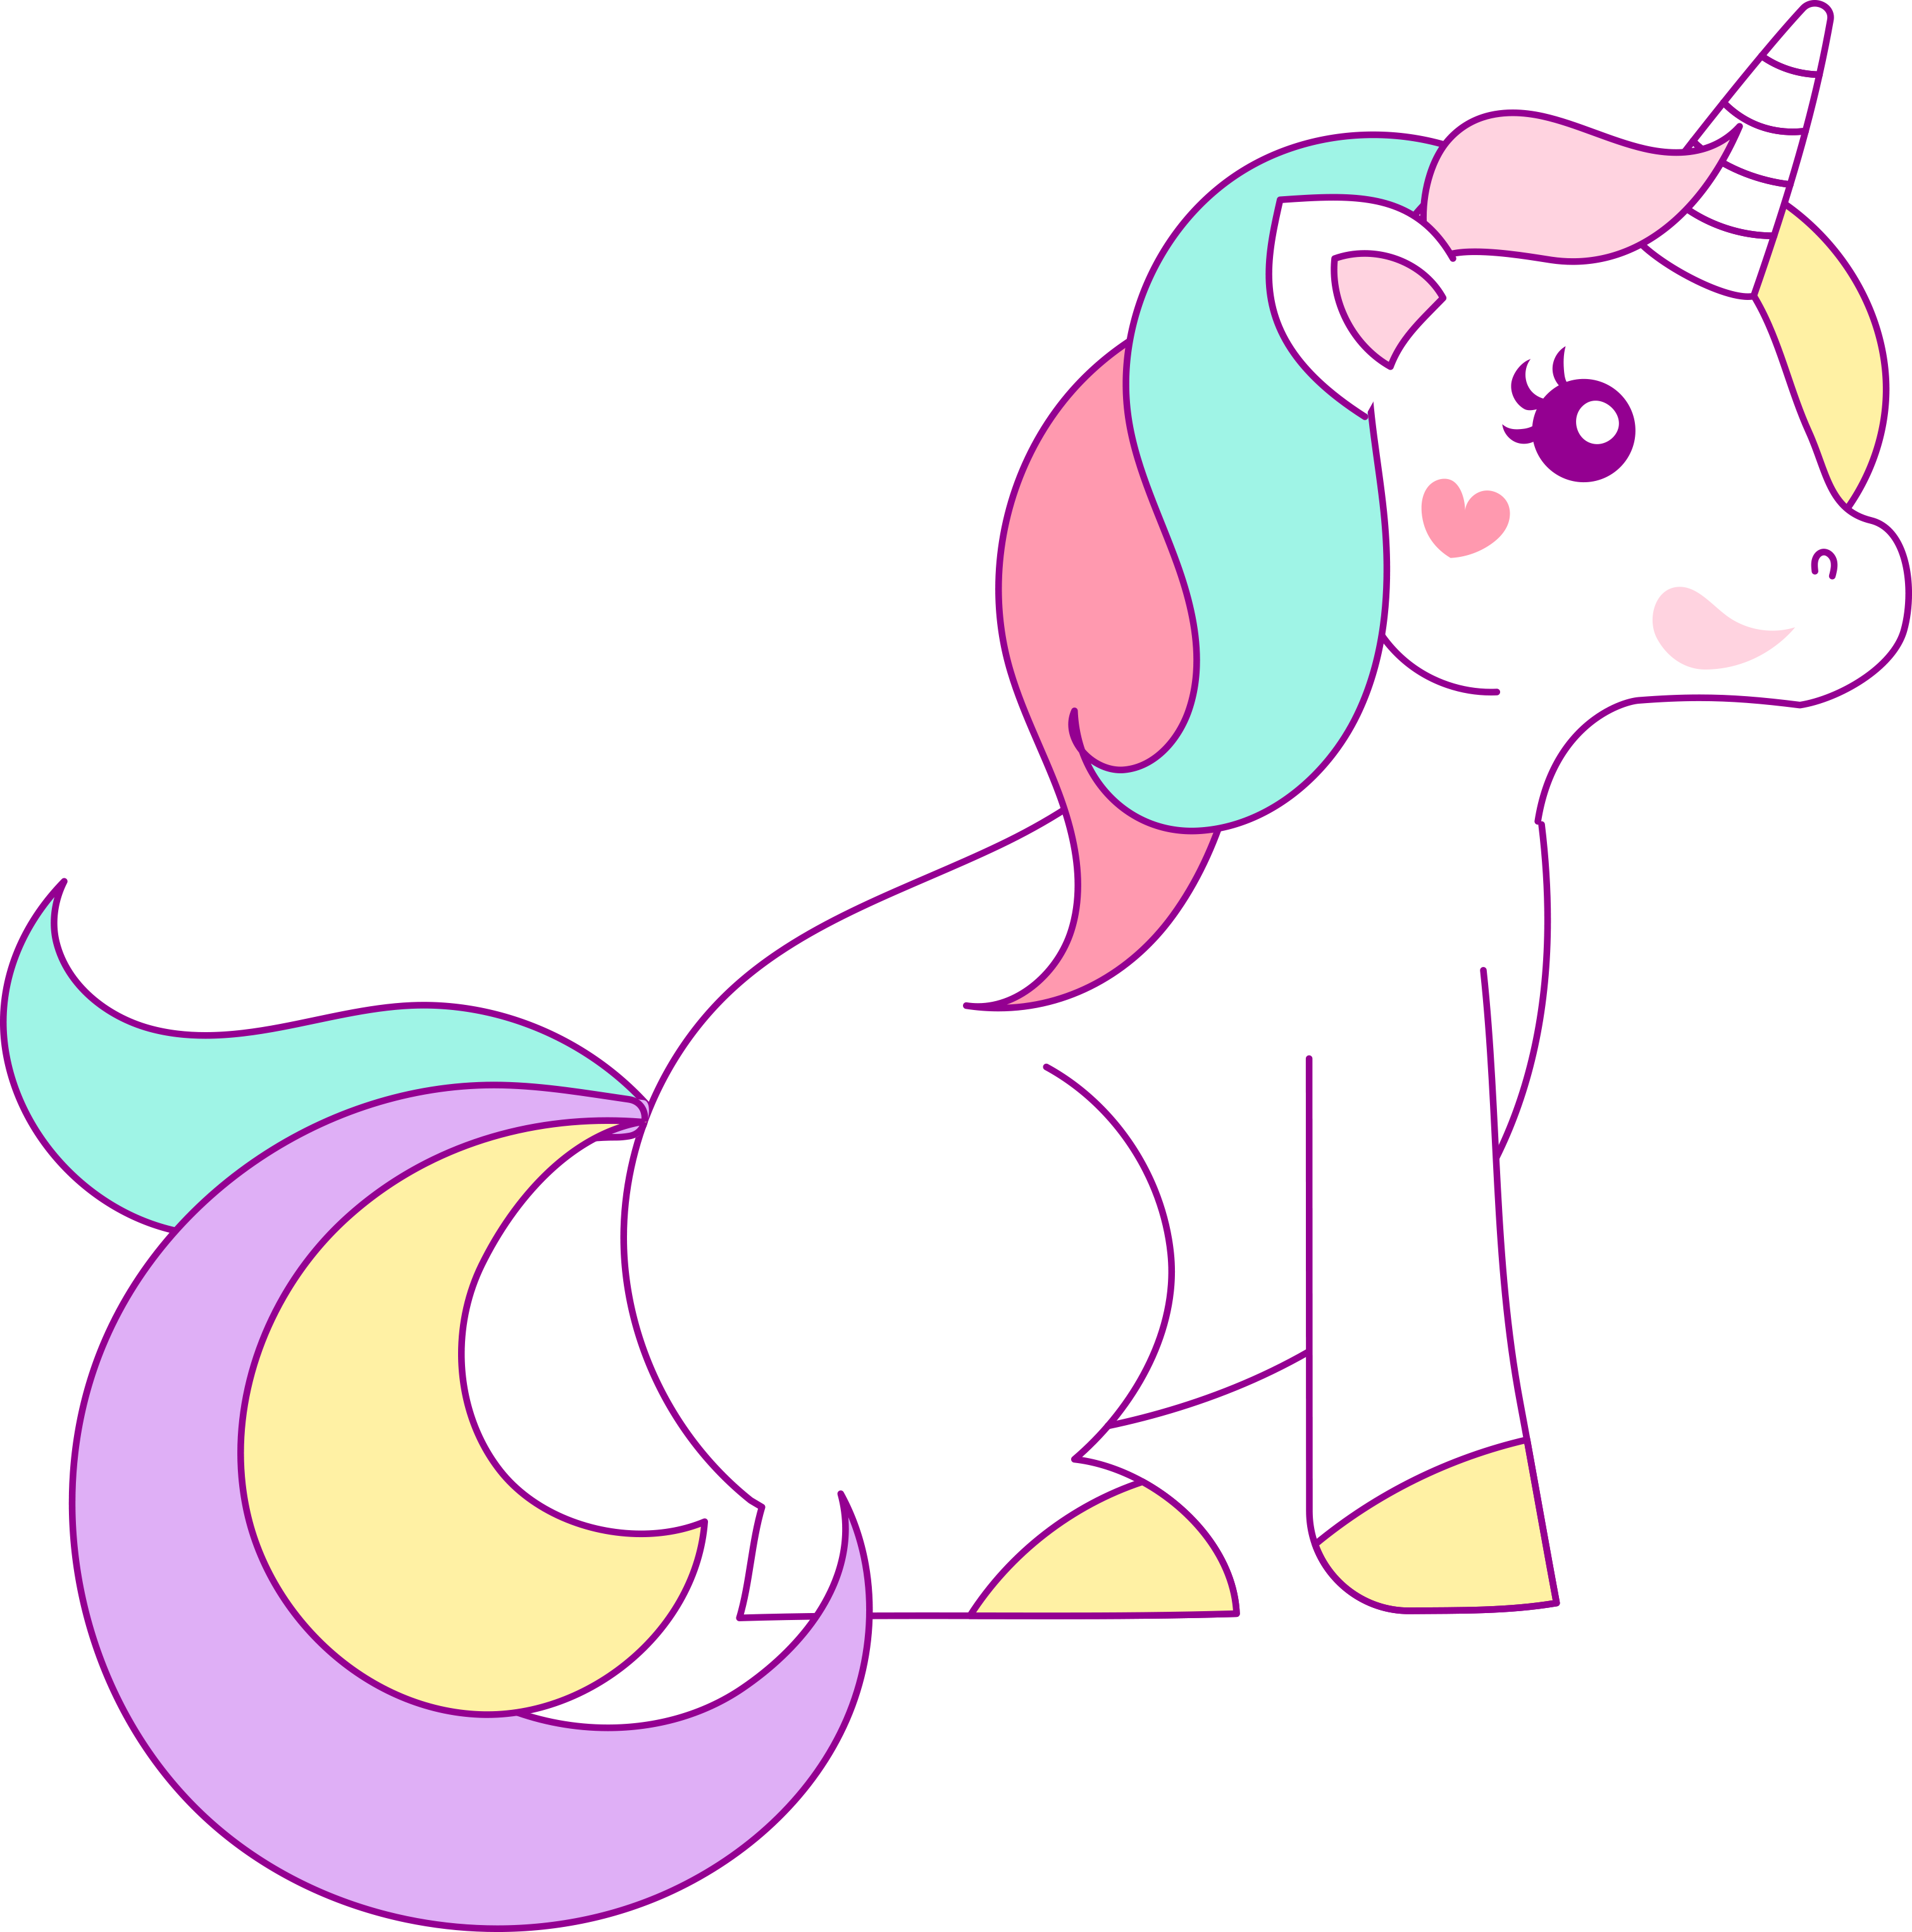 Free Hand Drawn Unicorn Clip Art - Free Pretty Things For You